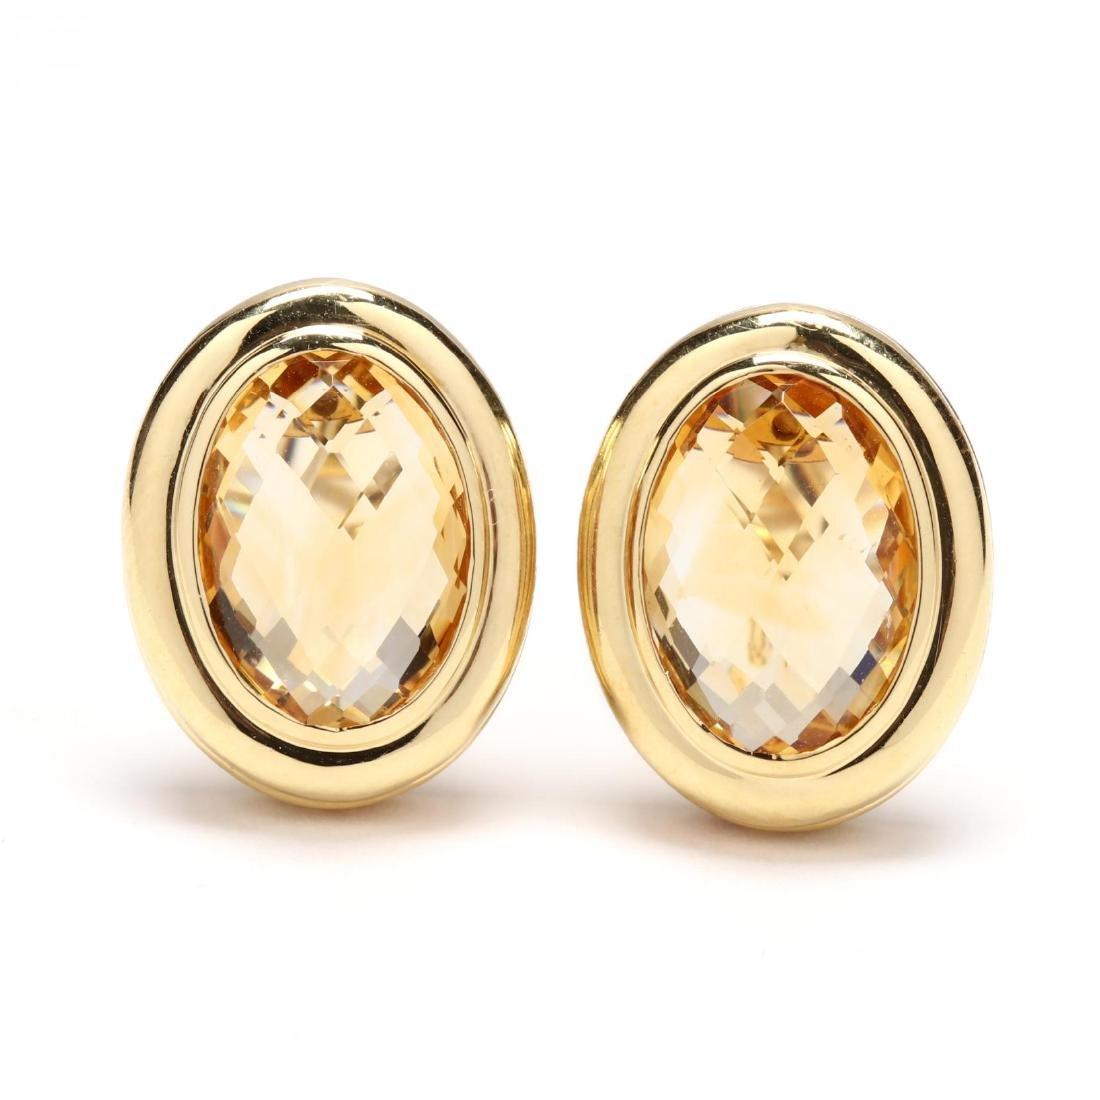 18KT Gold and Citrine Earrings, David Yurman